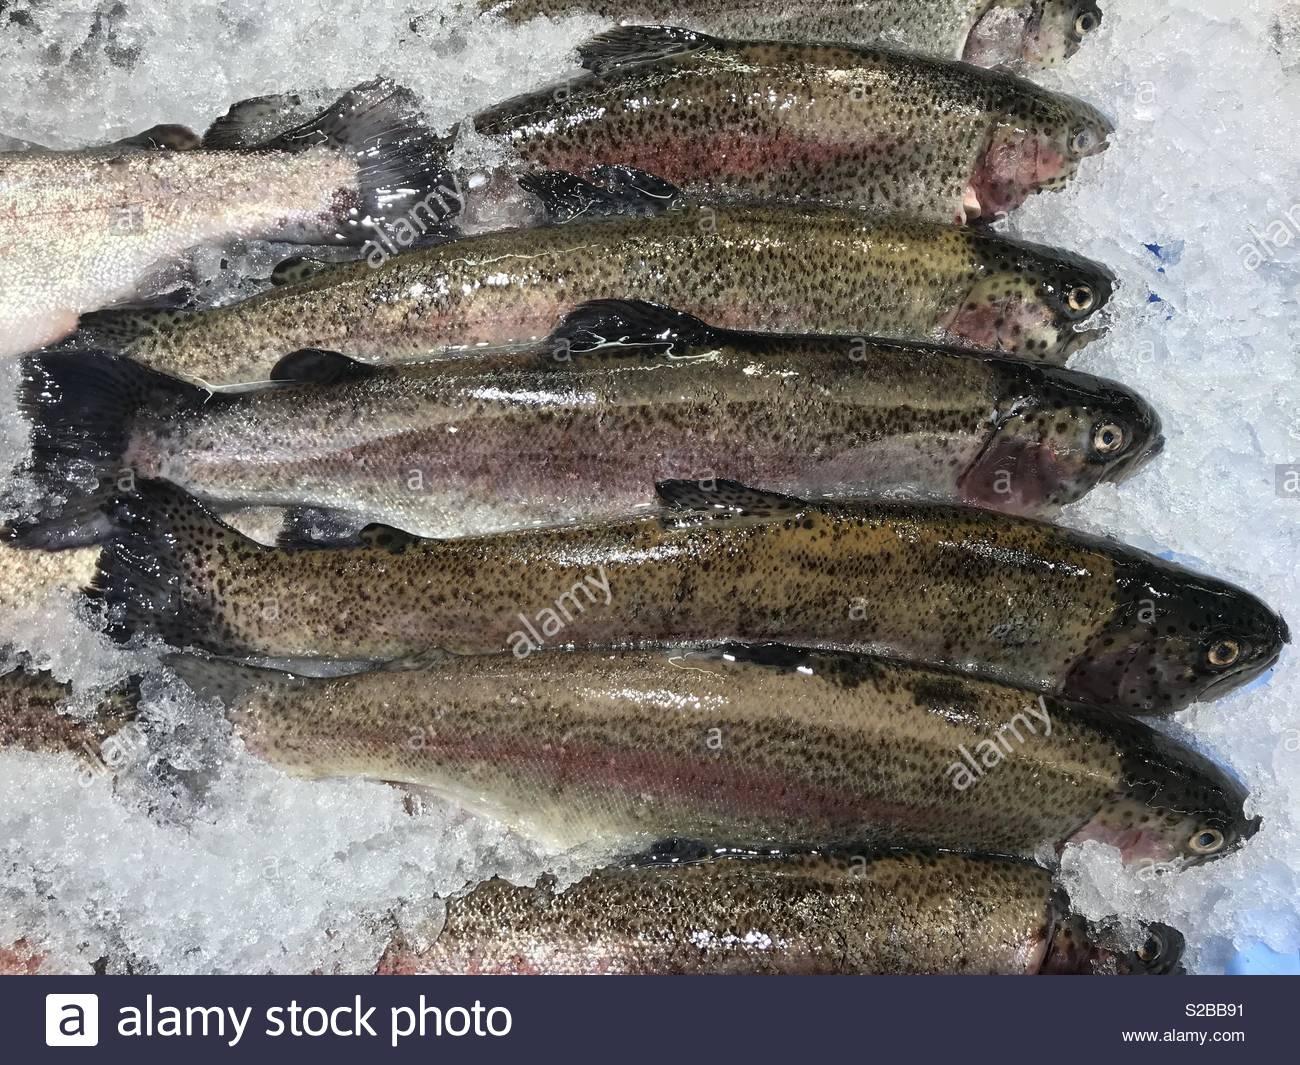 Trout fishing freshwater fish food - Stock Image